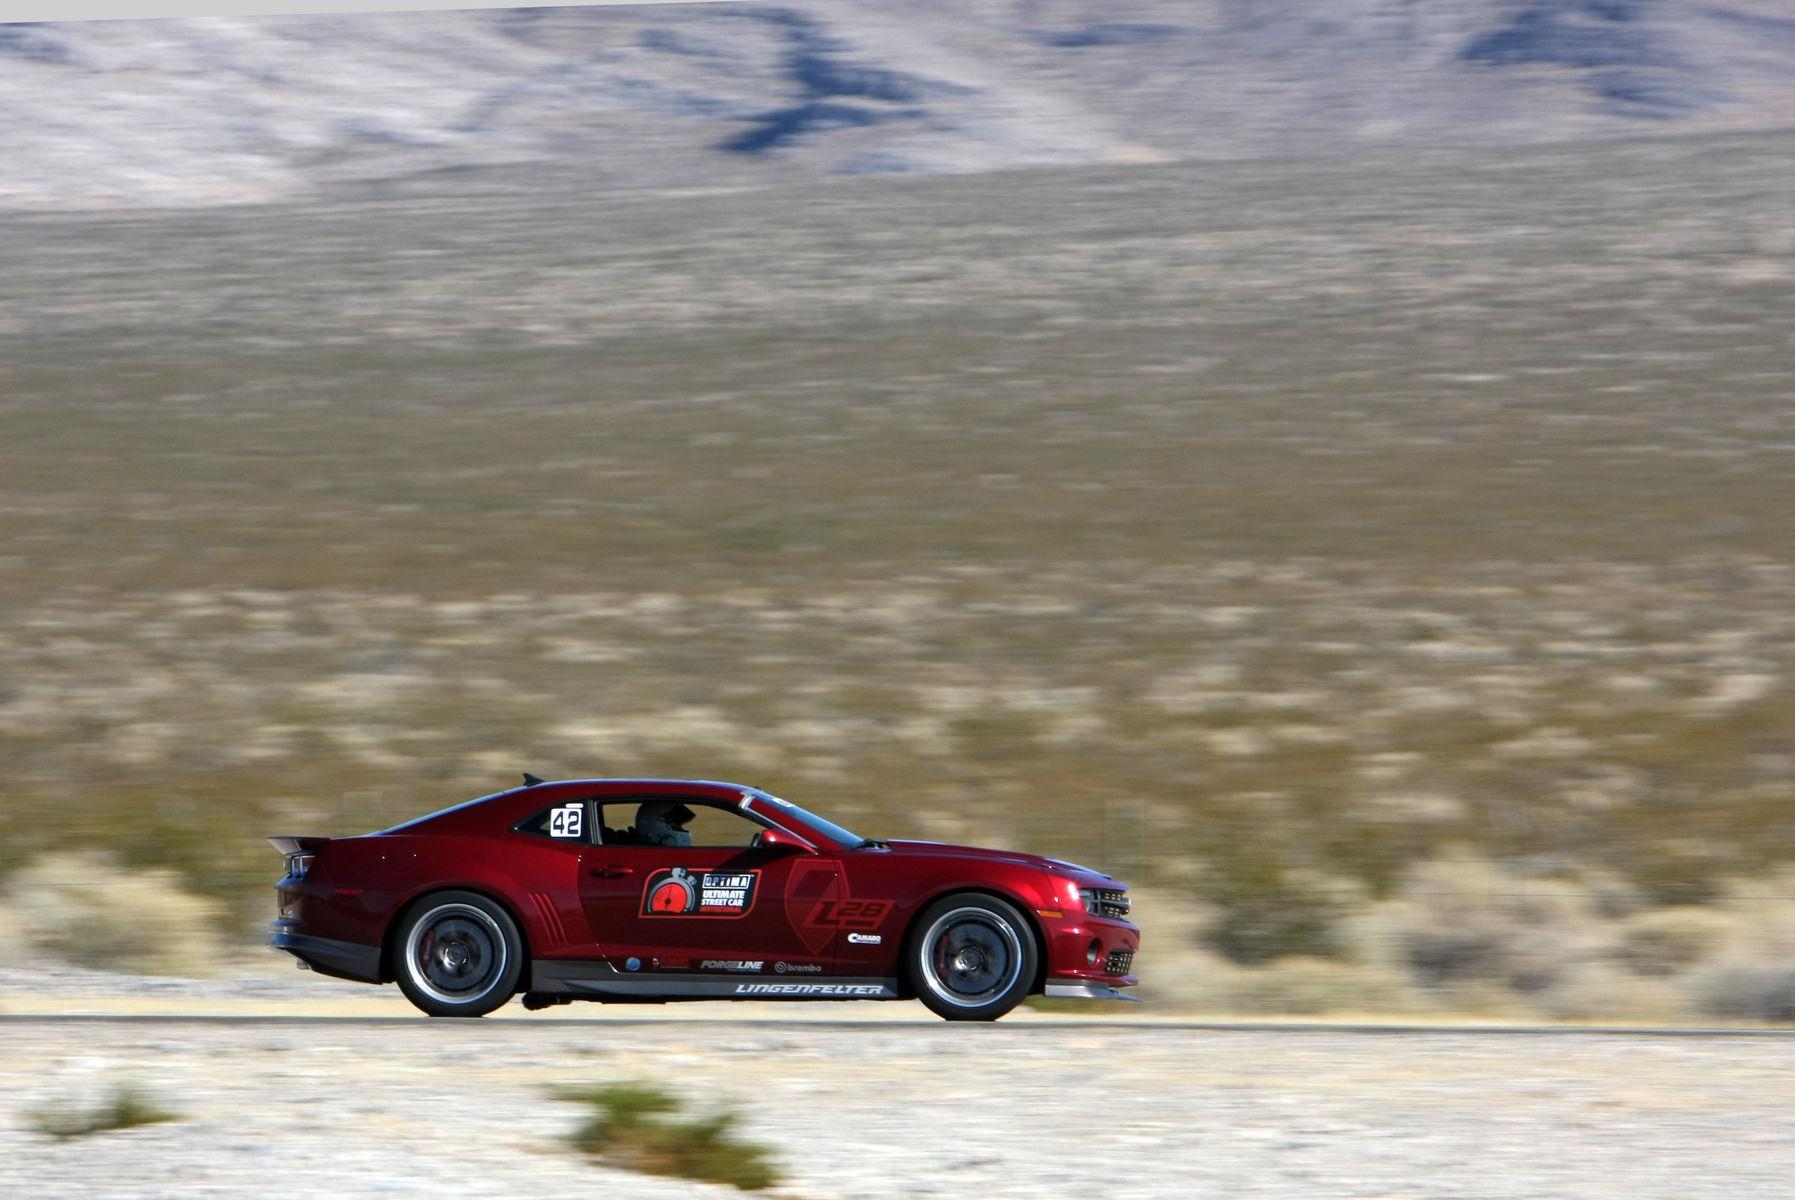 2010 Chevrolet Camaro | 2010 Lingenfelter L28 Camaro - Autocross - Las Vegas, NV -1